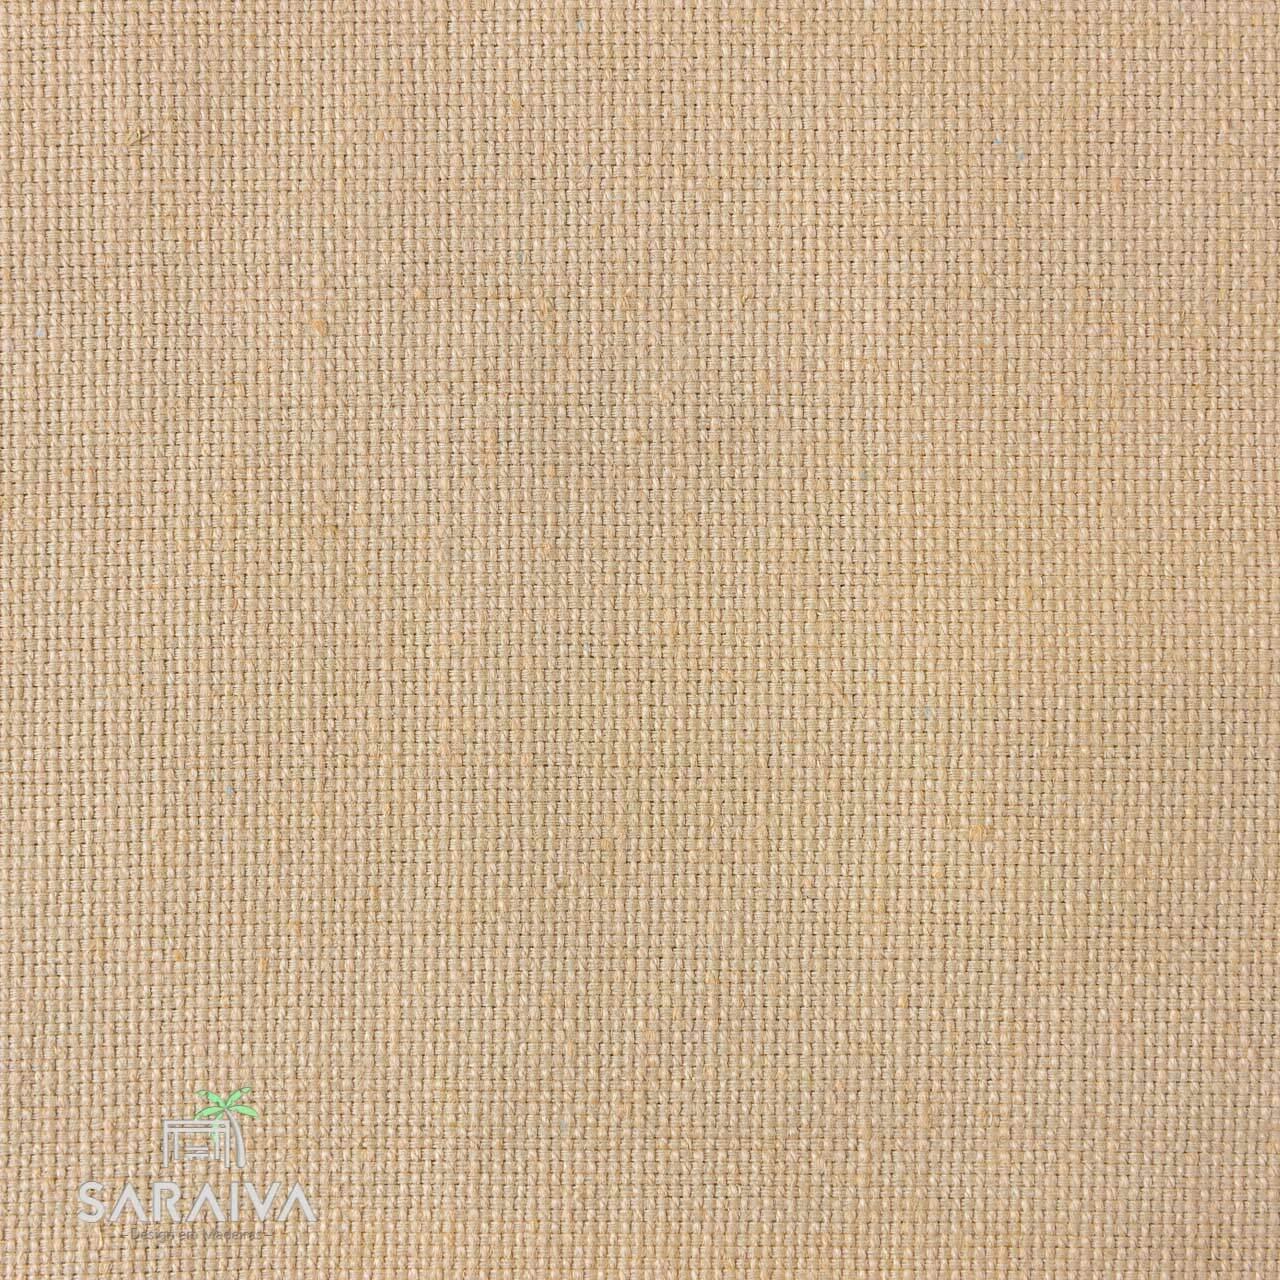 forro-de-palha-traditional-saraiva-design